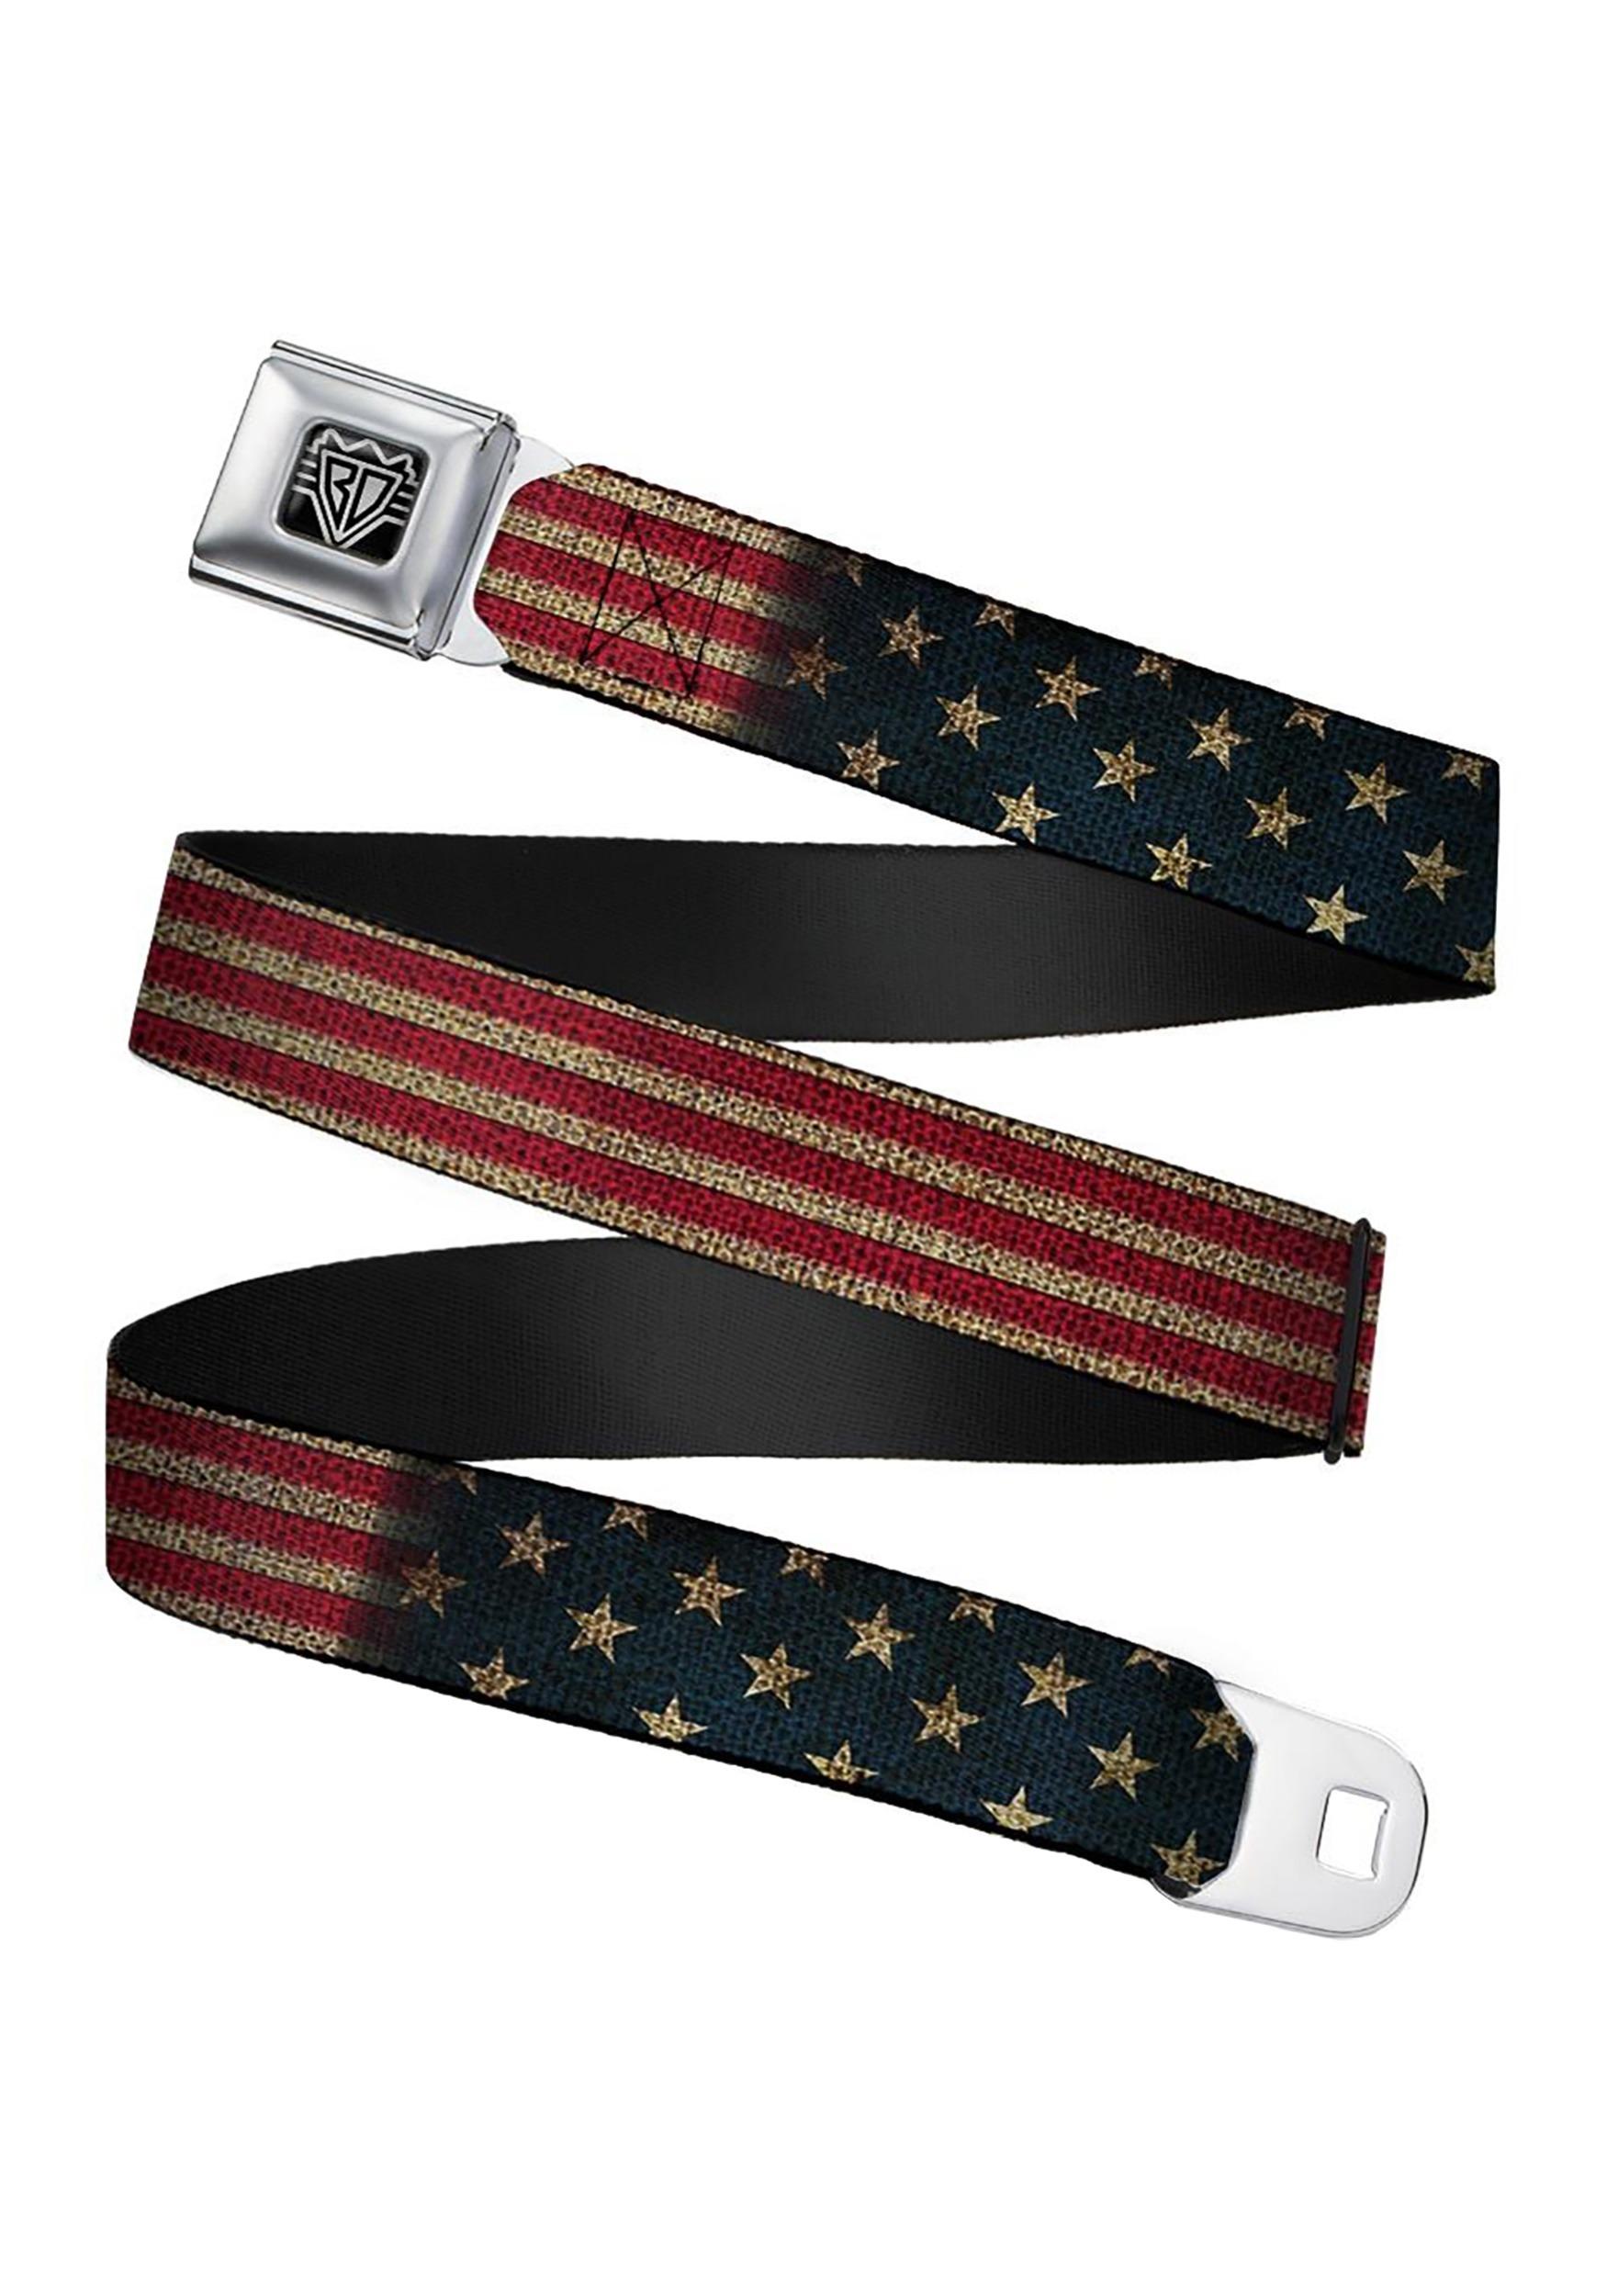 Seatbelt_Buckle_Belt_Featuring_Vintage_USA_Flag